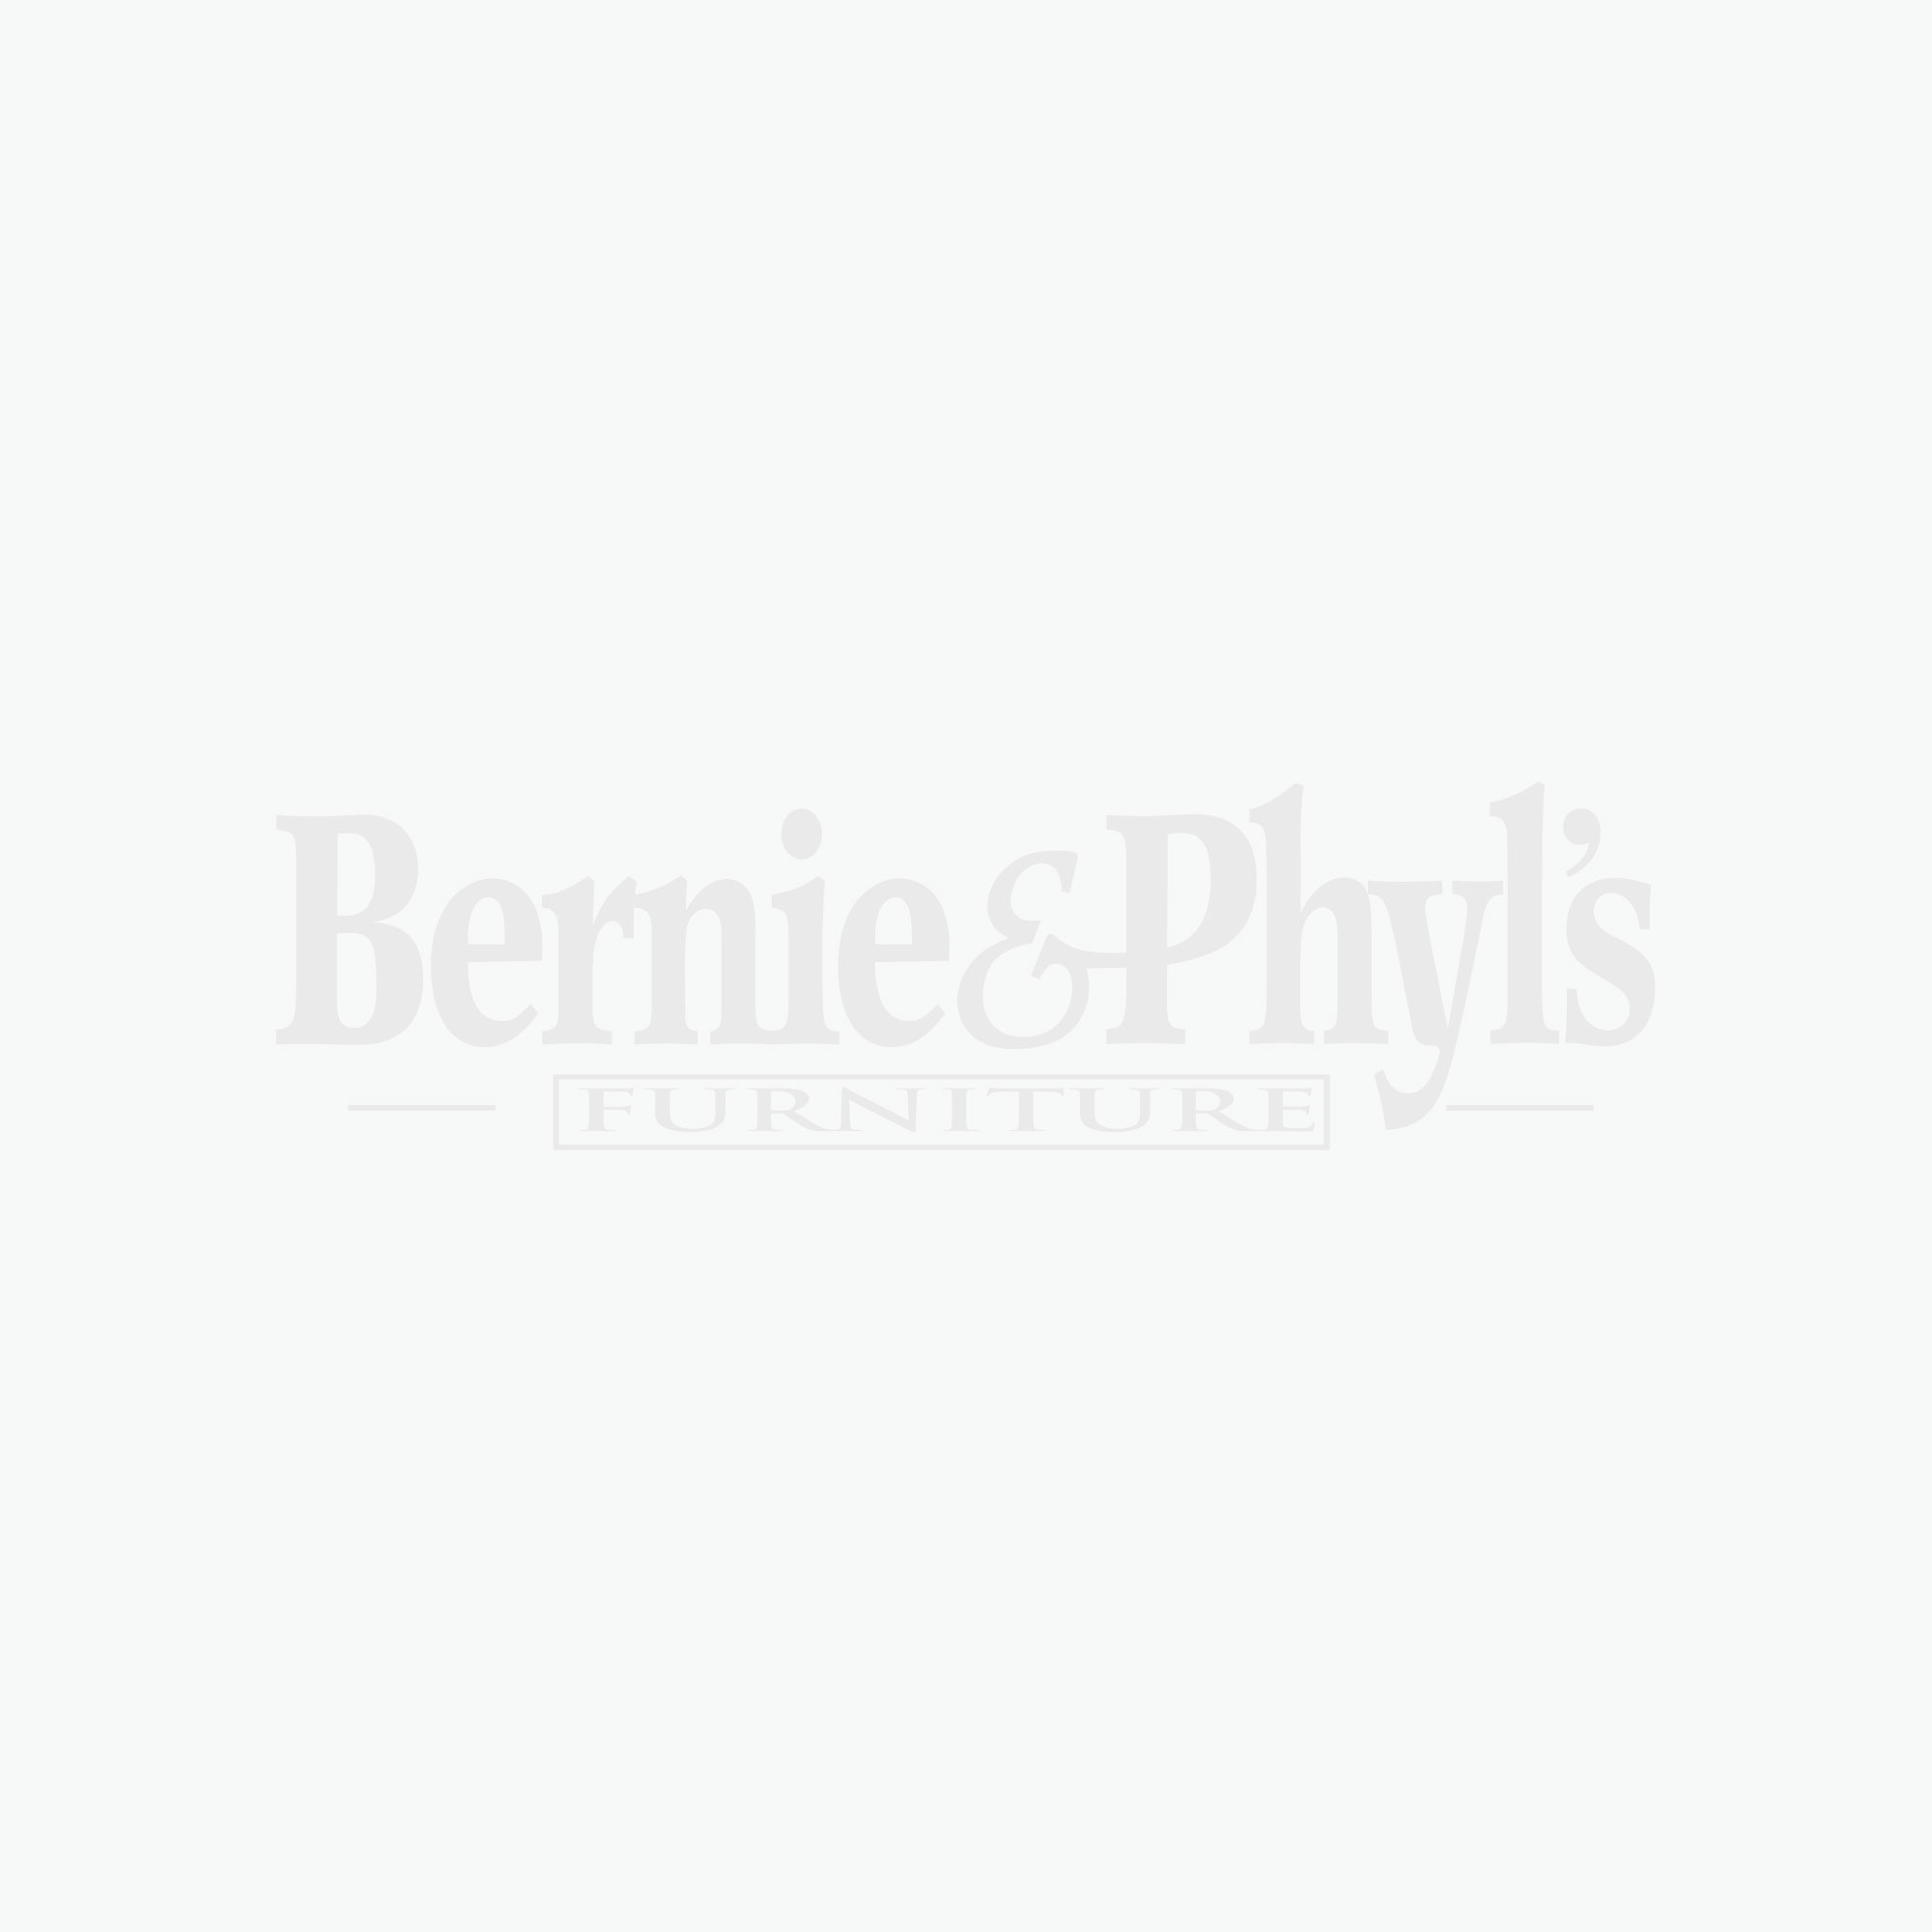 Lawson Goa 3 Piece Sectional - Bernie u0026 Phylu0027s Furniture - by Jackson Catnapper  sc 1 st  Bernie u0026 Phylu0027s Furniture : jackson leather sectional - Sectionals, Sofas & Couches